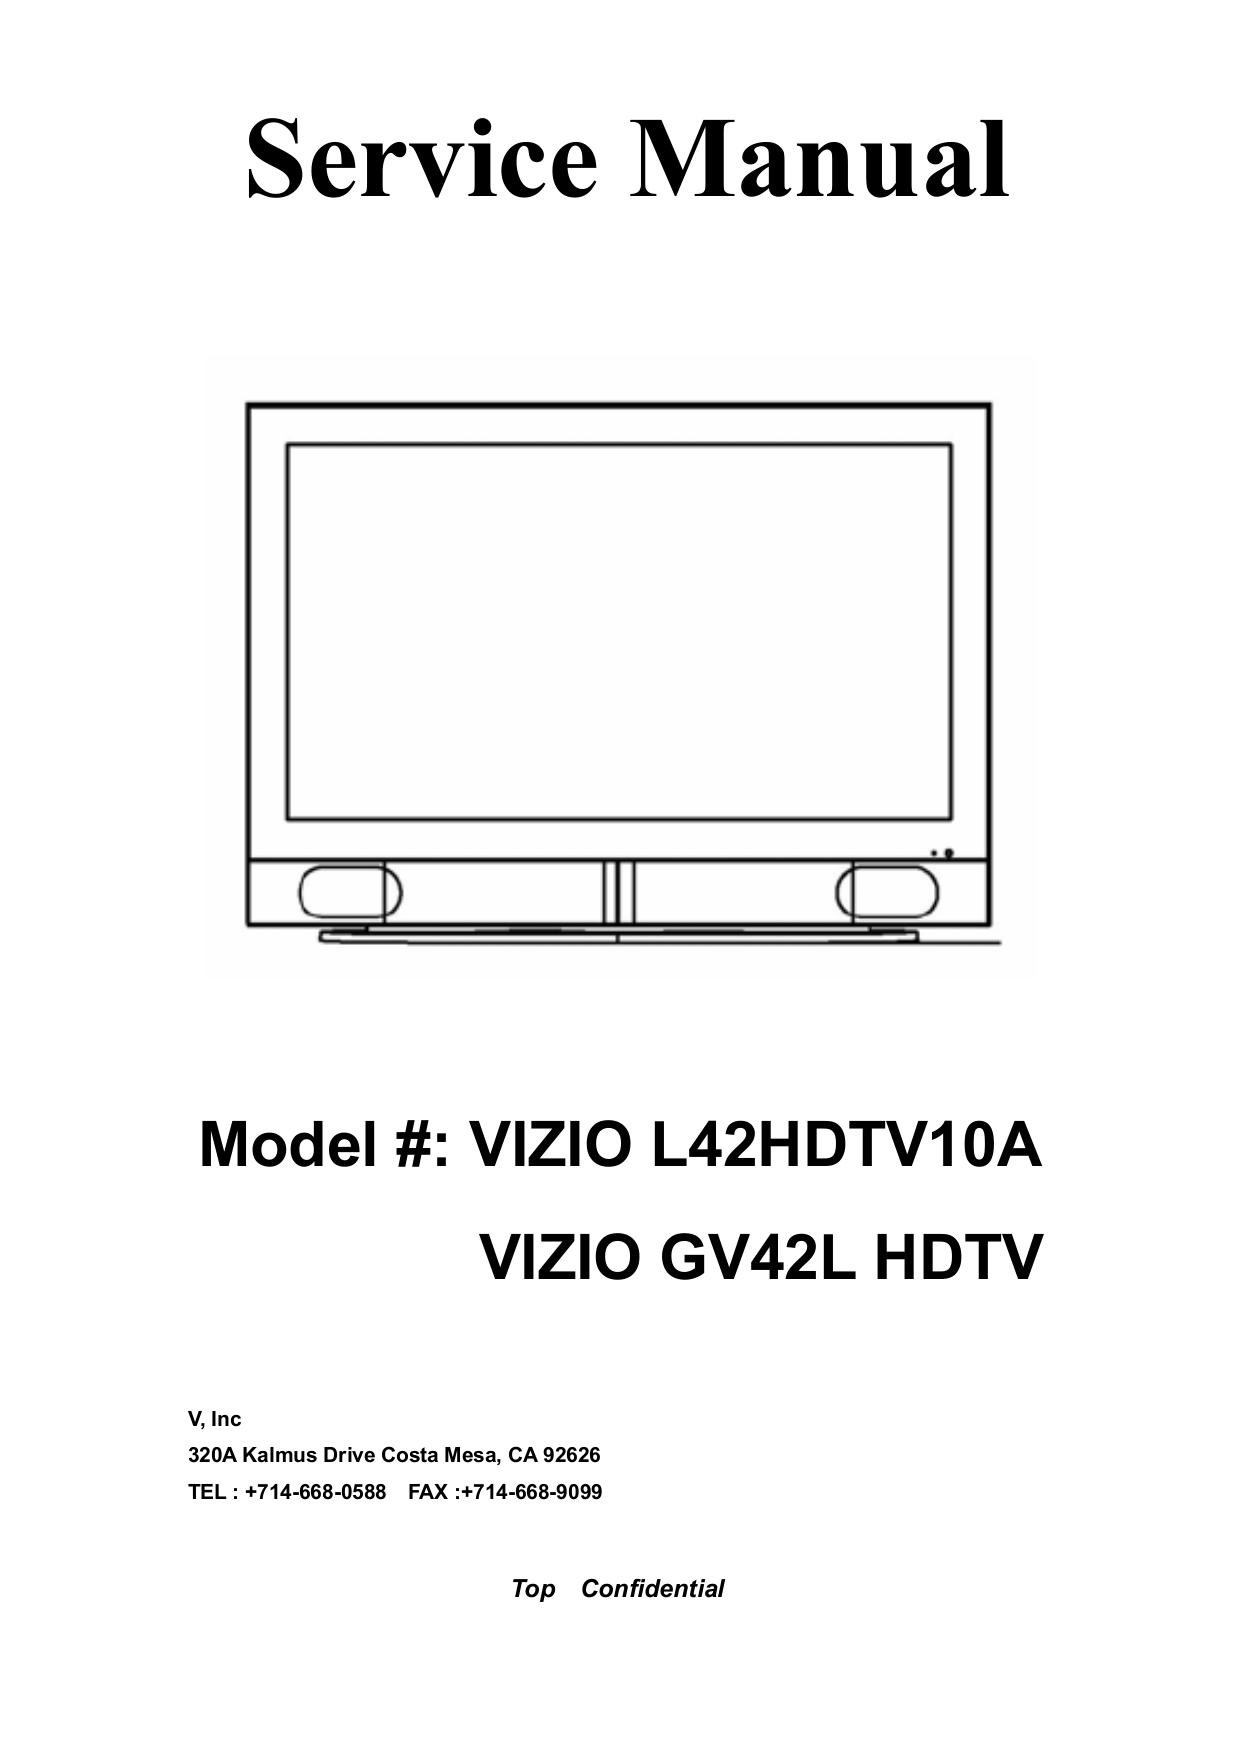 download free pdf for vizio vf550m tv manual rh umlib com vizio vf550m owners manual Vizio TV Parts